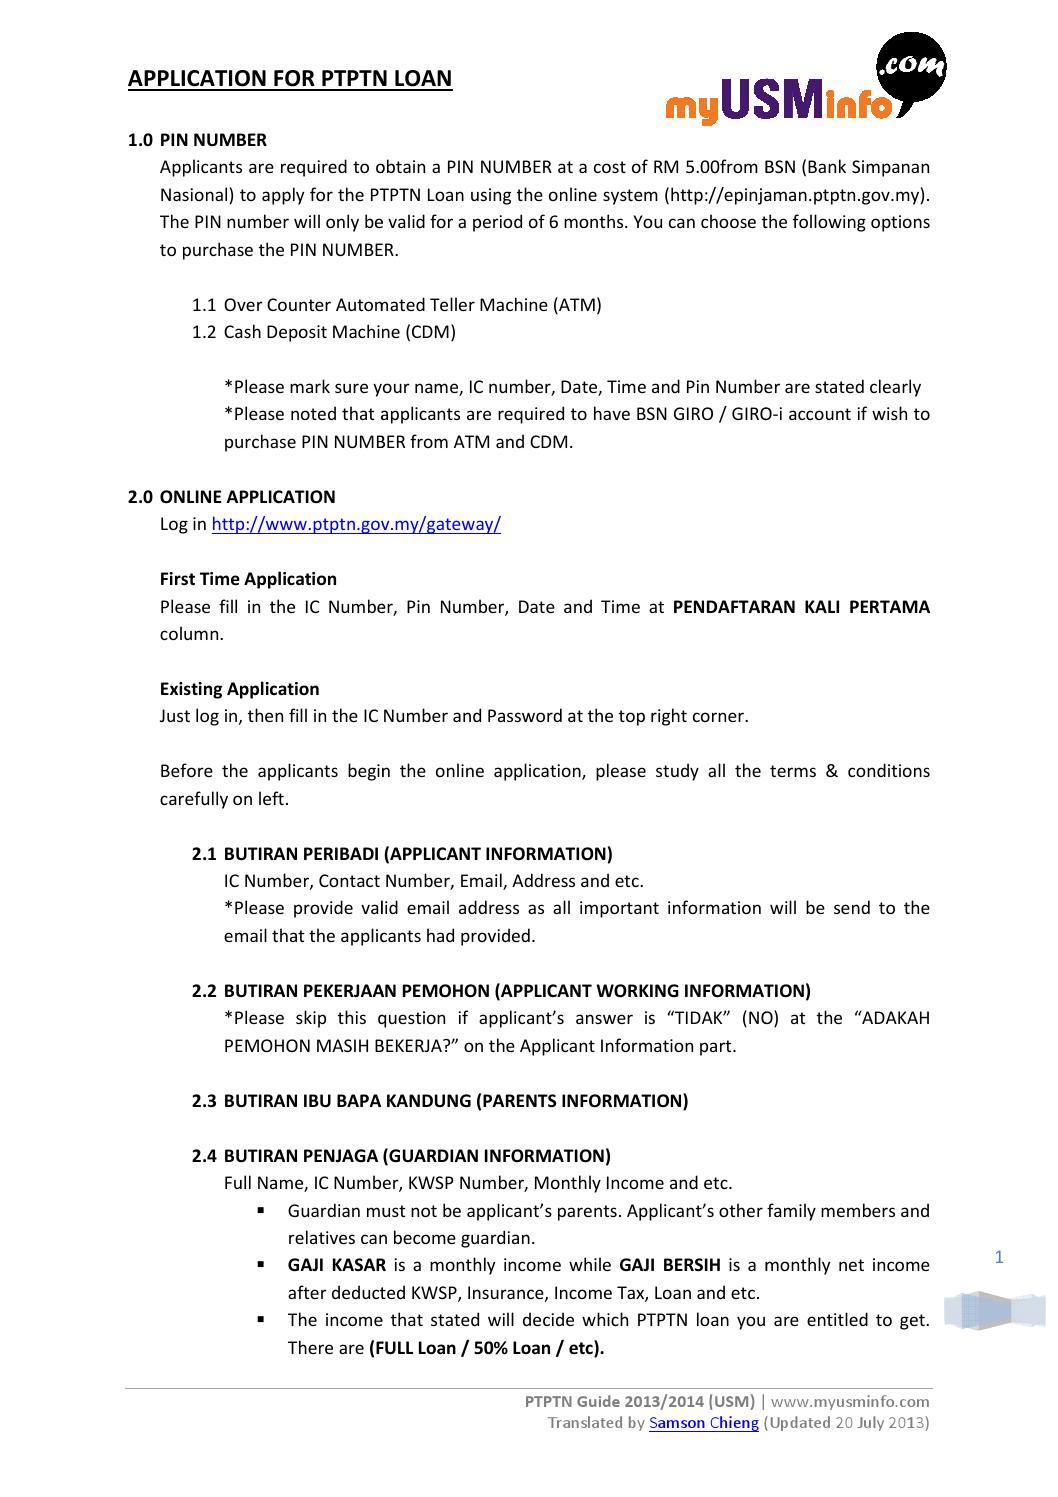 Ptptn Guide 2013 2014 Usm English By Wen Xu Issuu